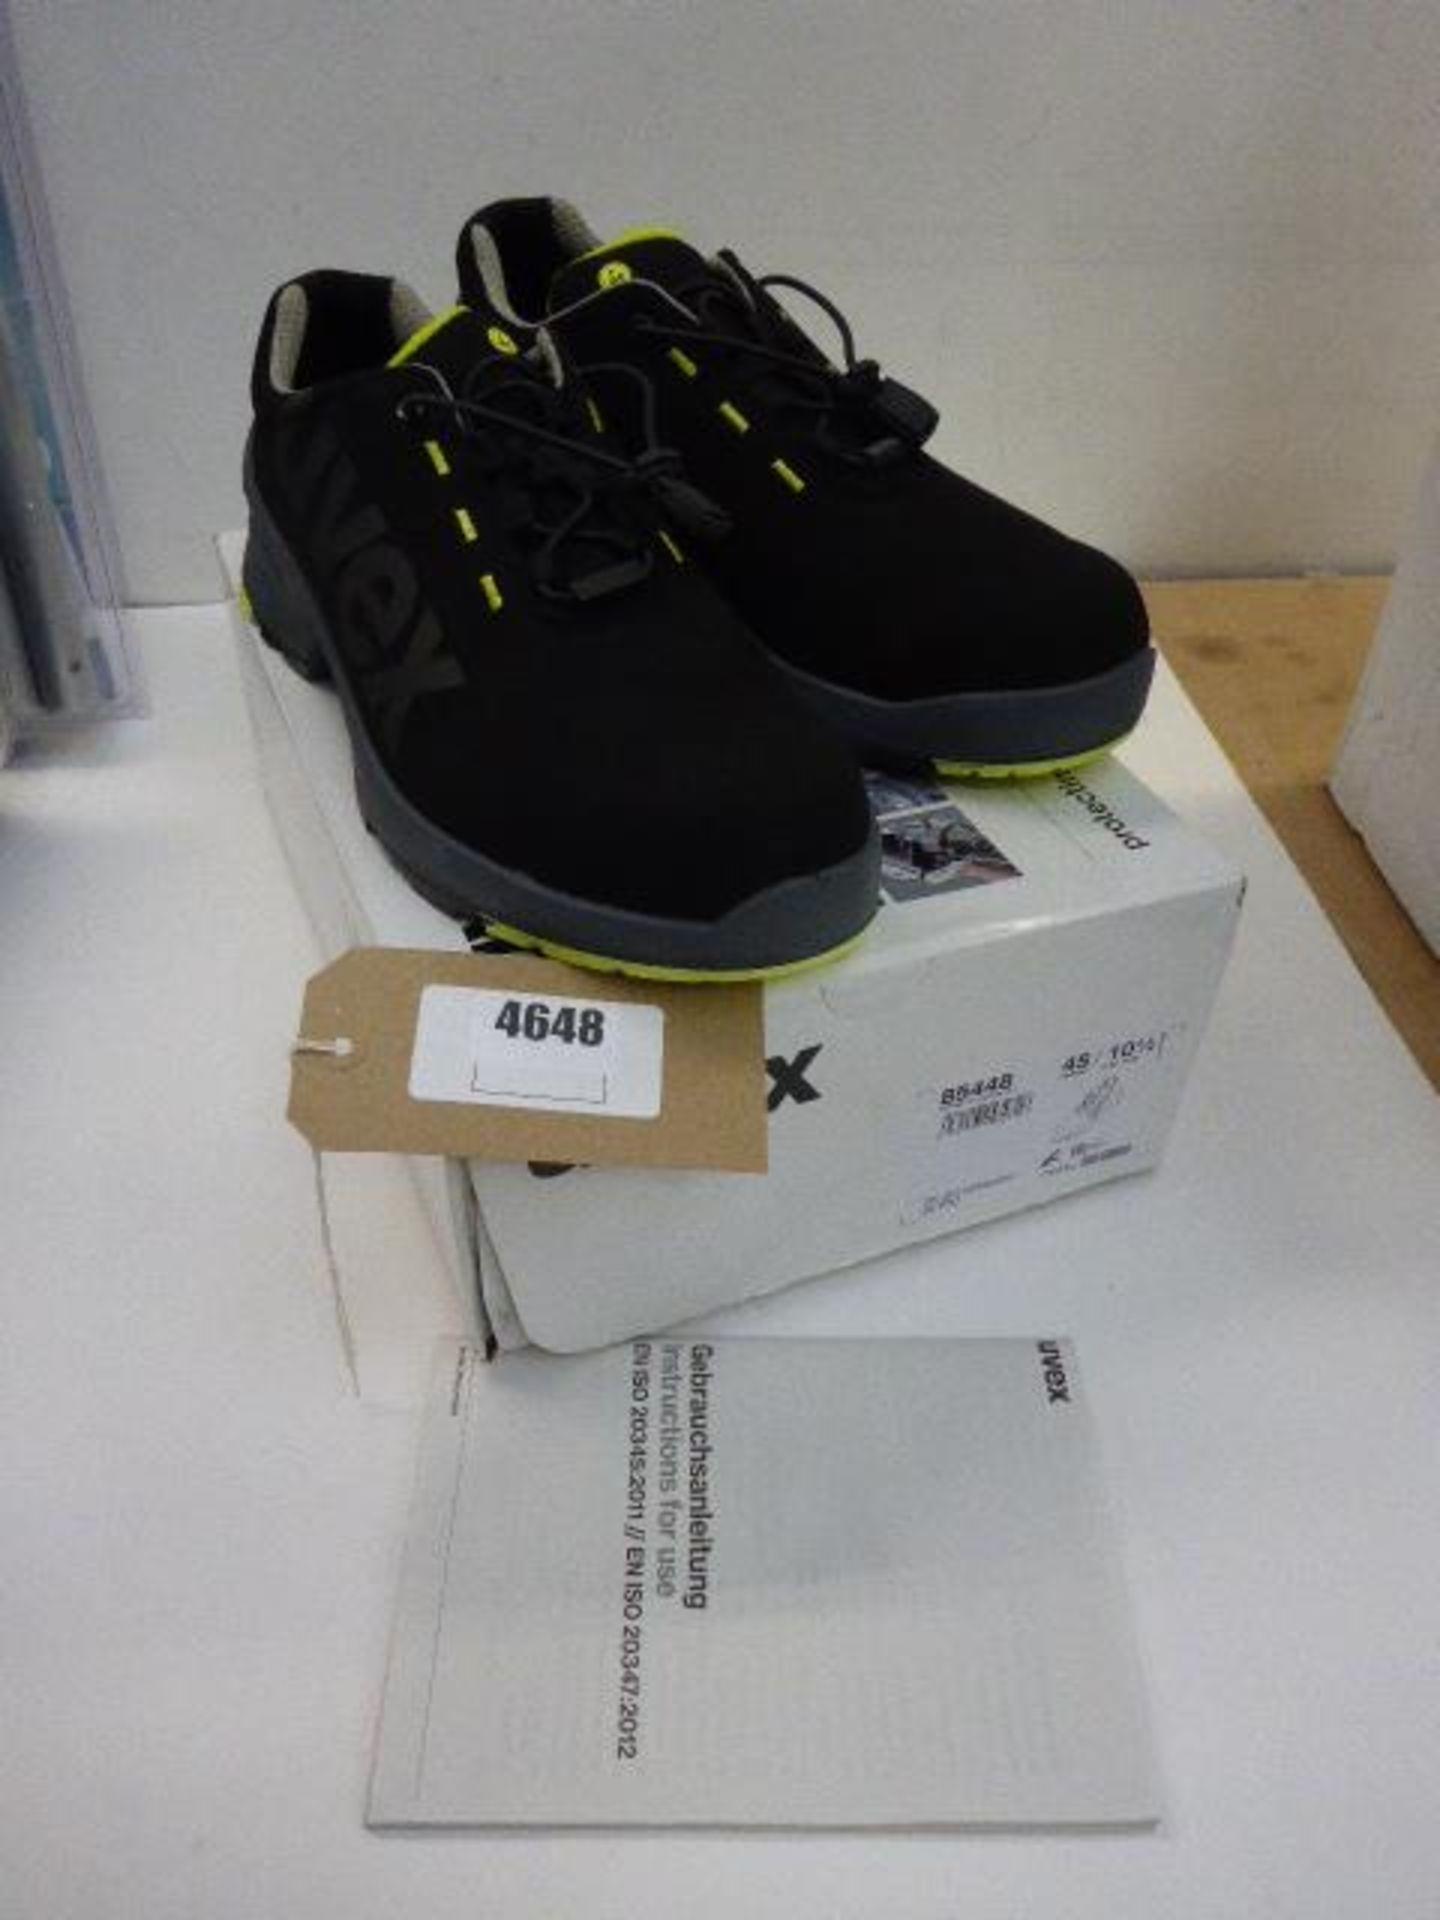 Lot 4648 - Uvex men's safety shoes Size 10.5